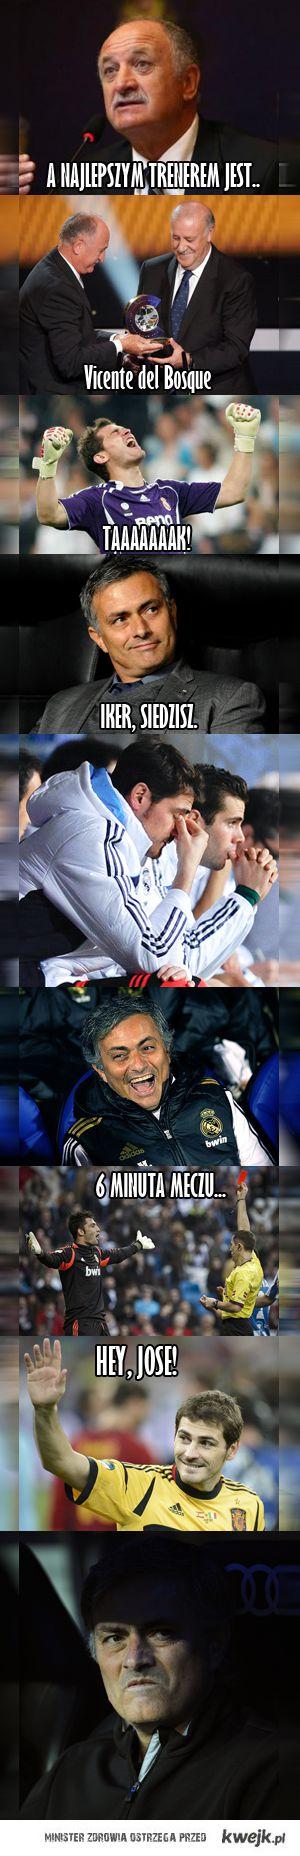 Iker i Jose.